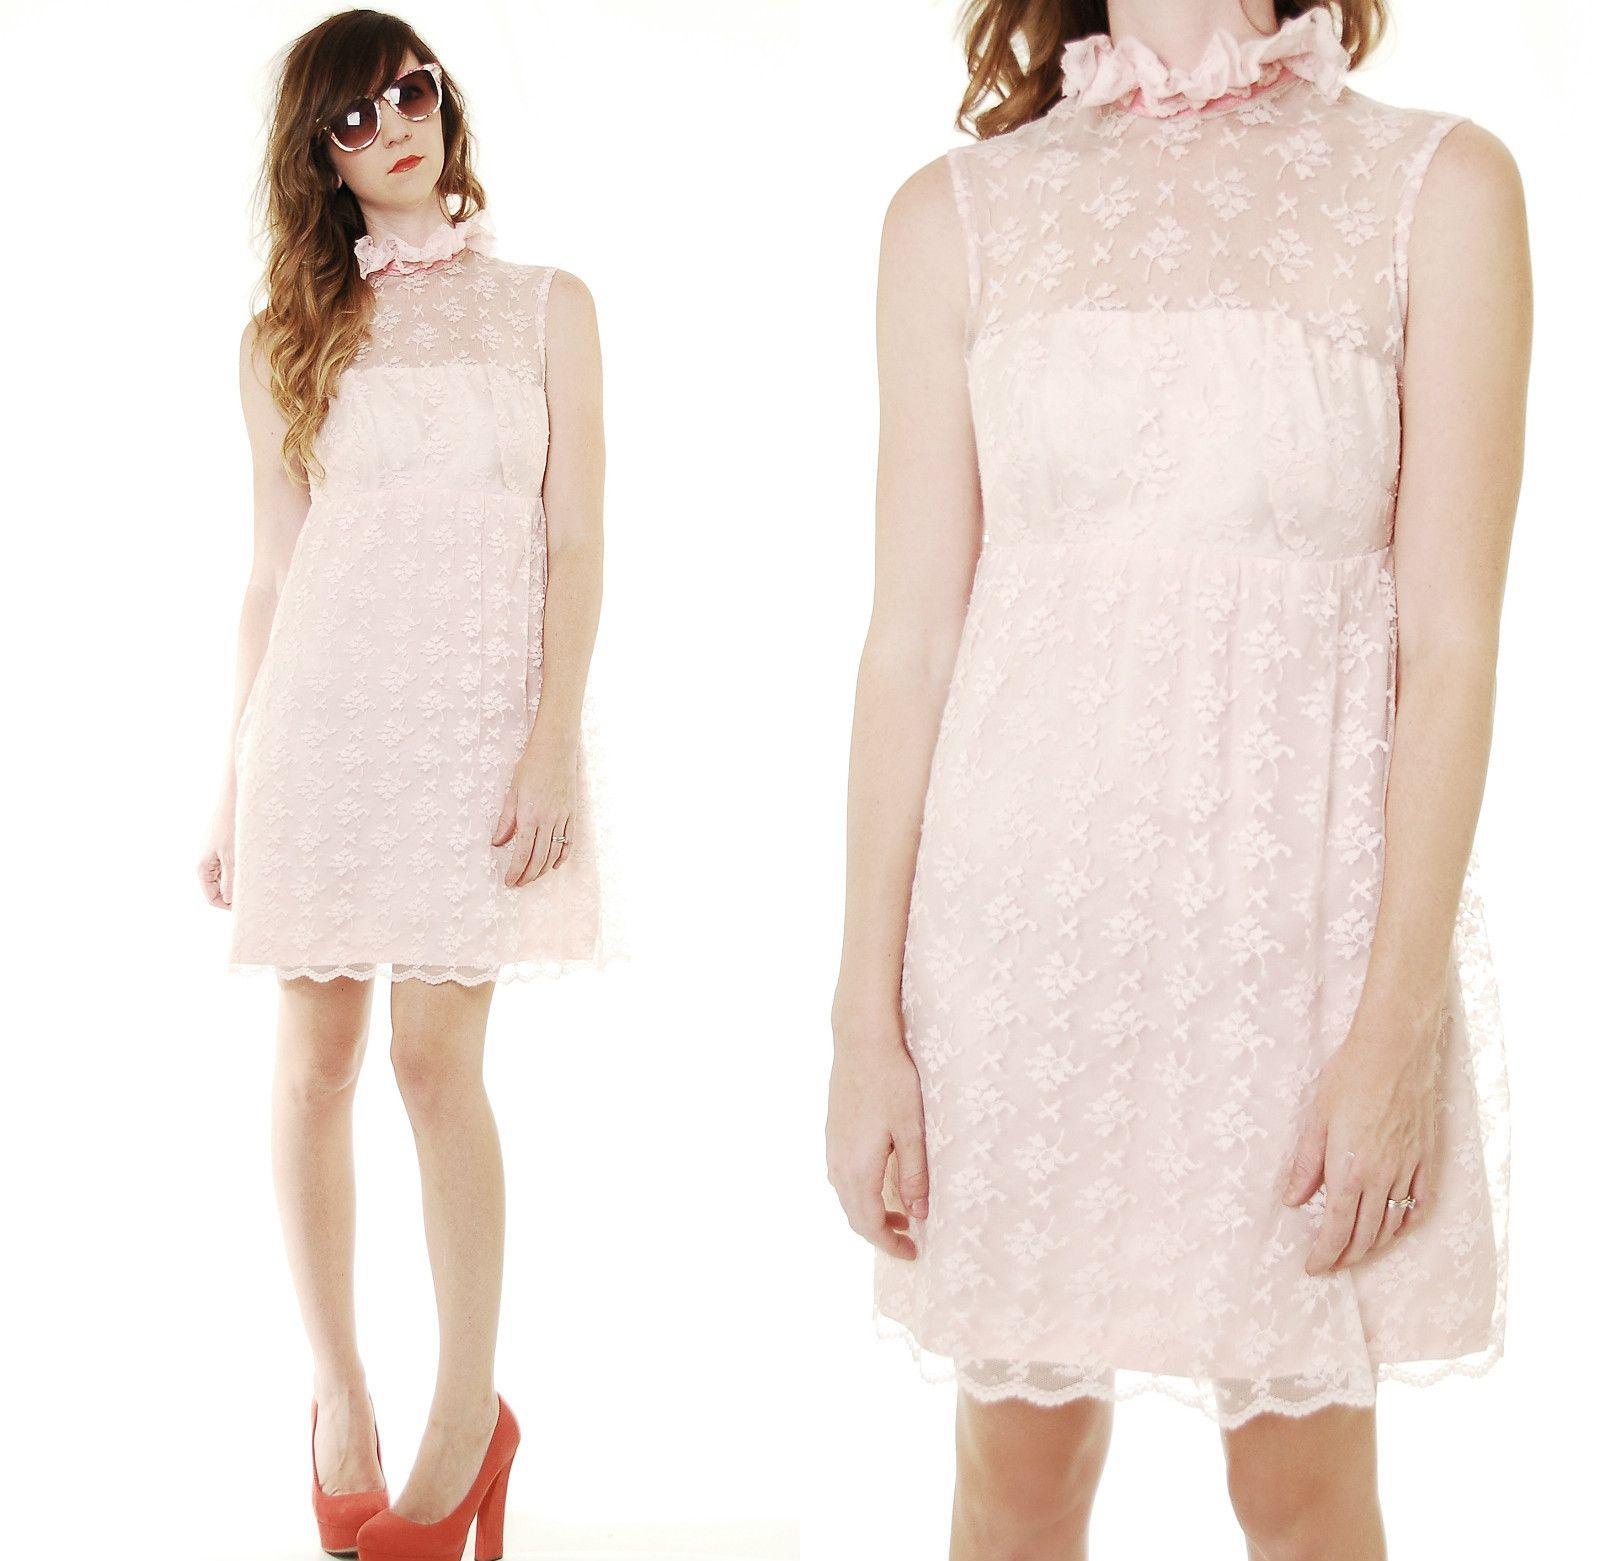 Pretty pink lace 60s dress